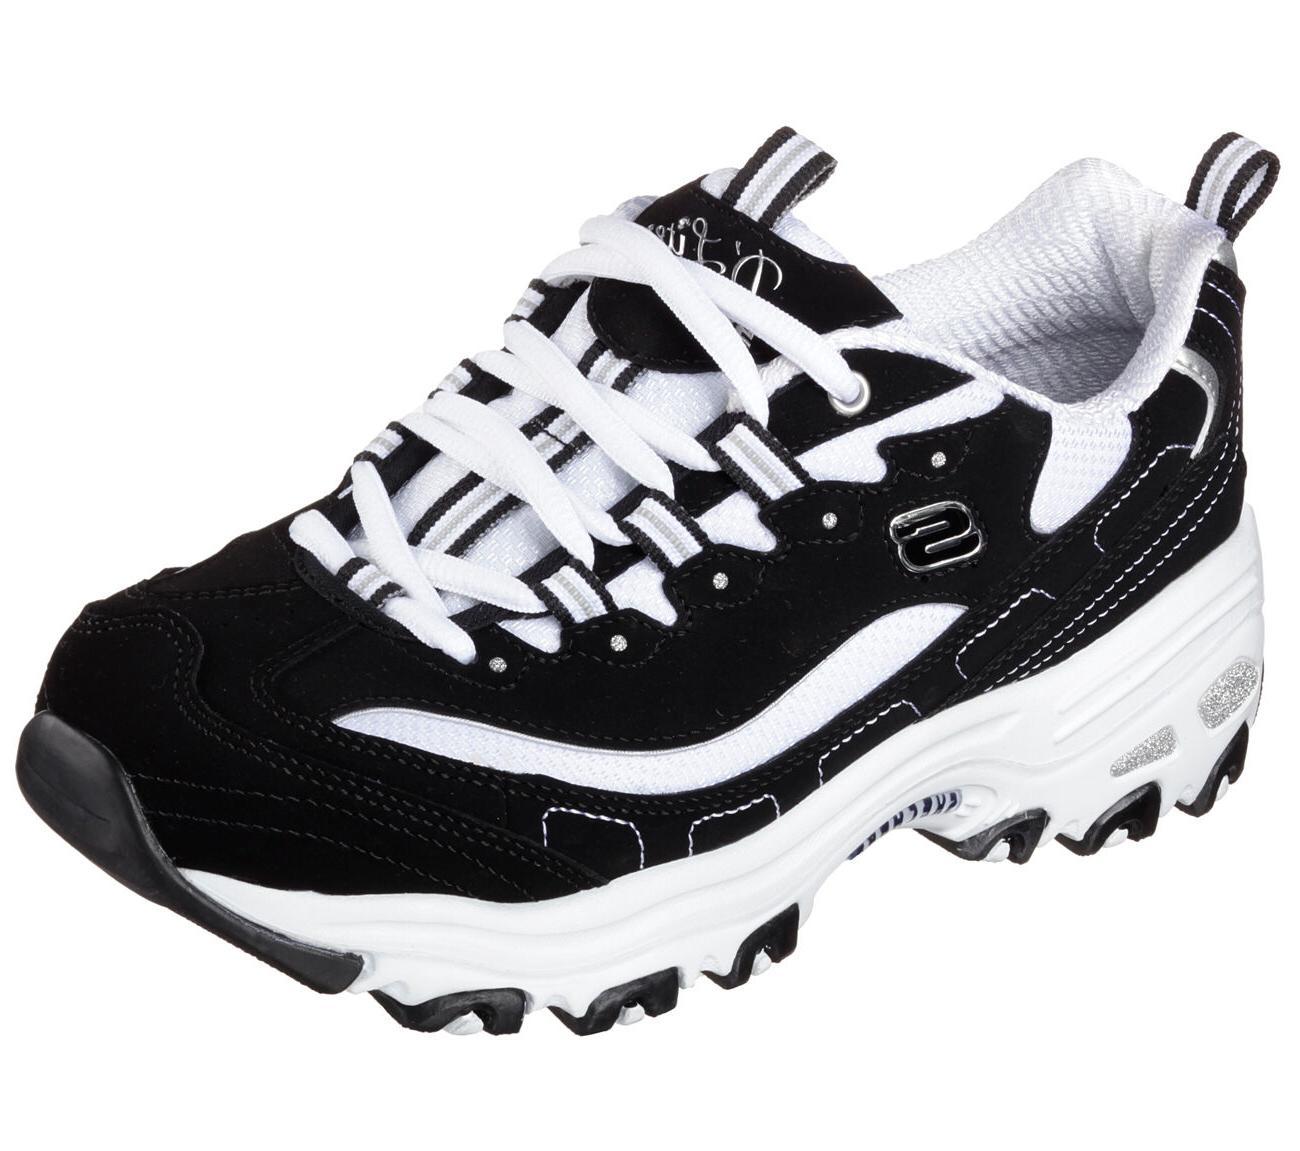 Skechers Black D'lites BKW Shoes Women's Sporty Casual Comfo